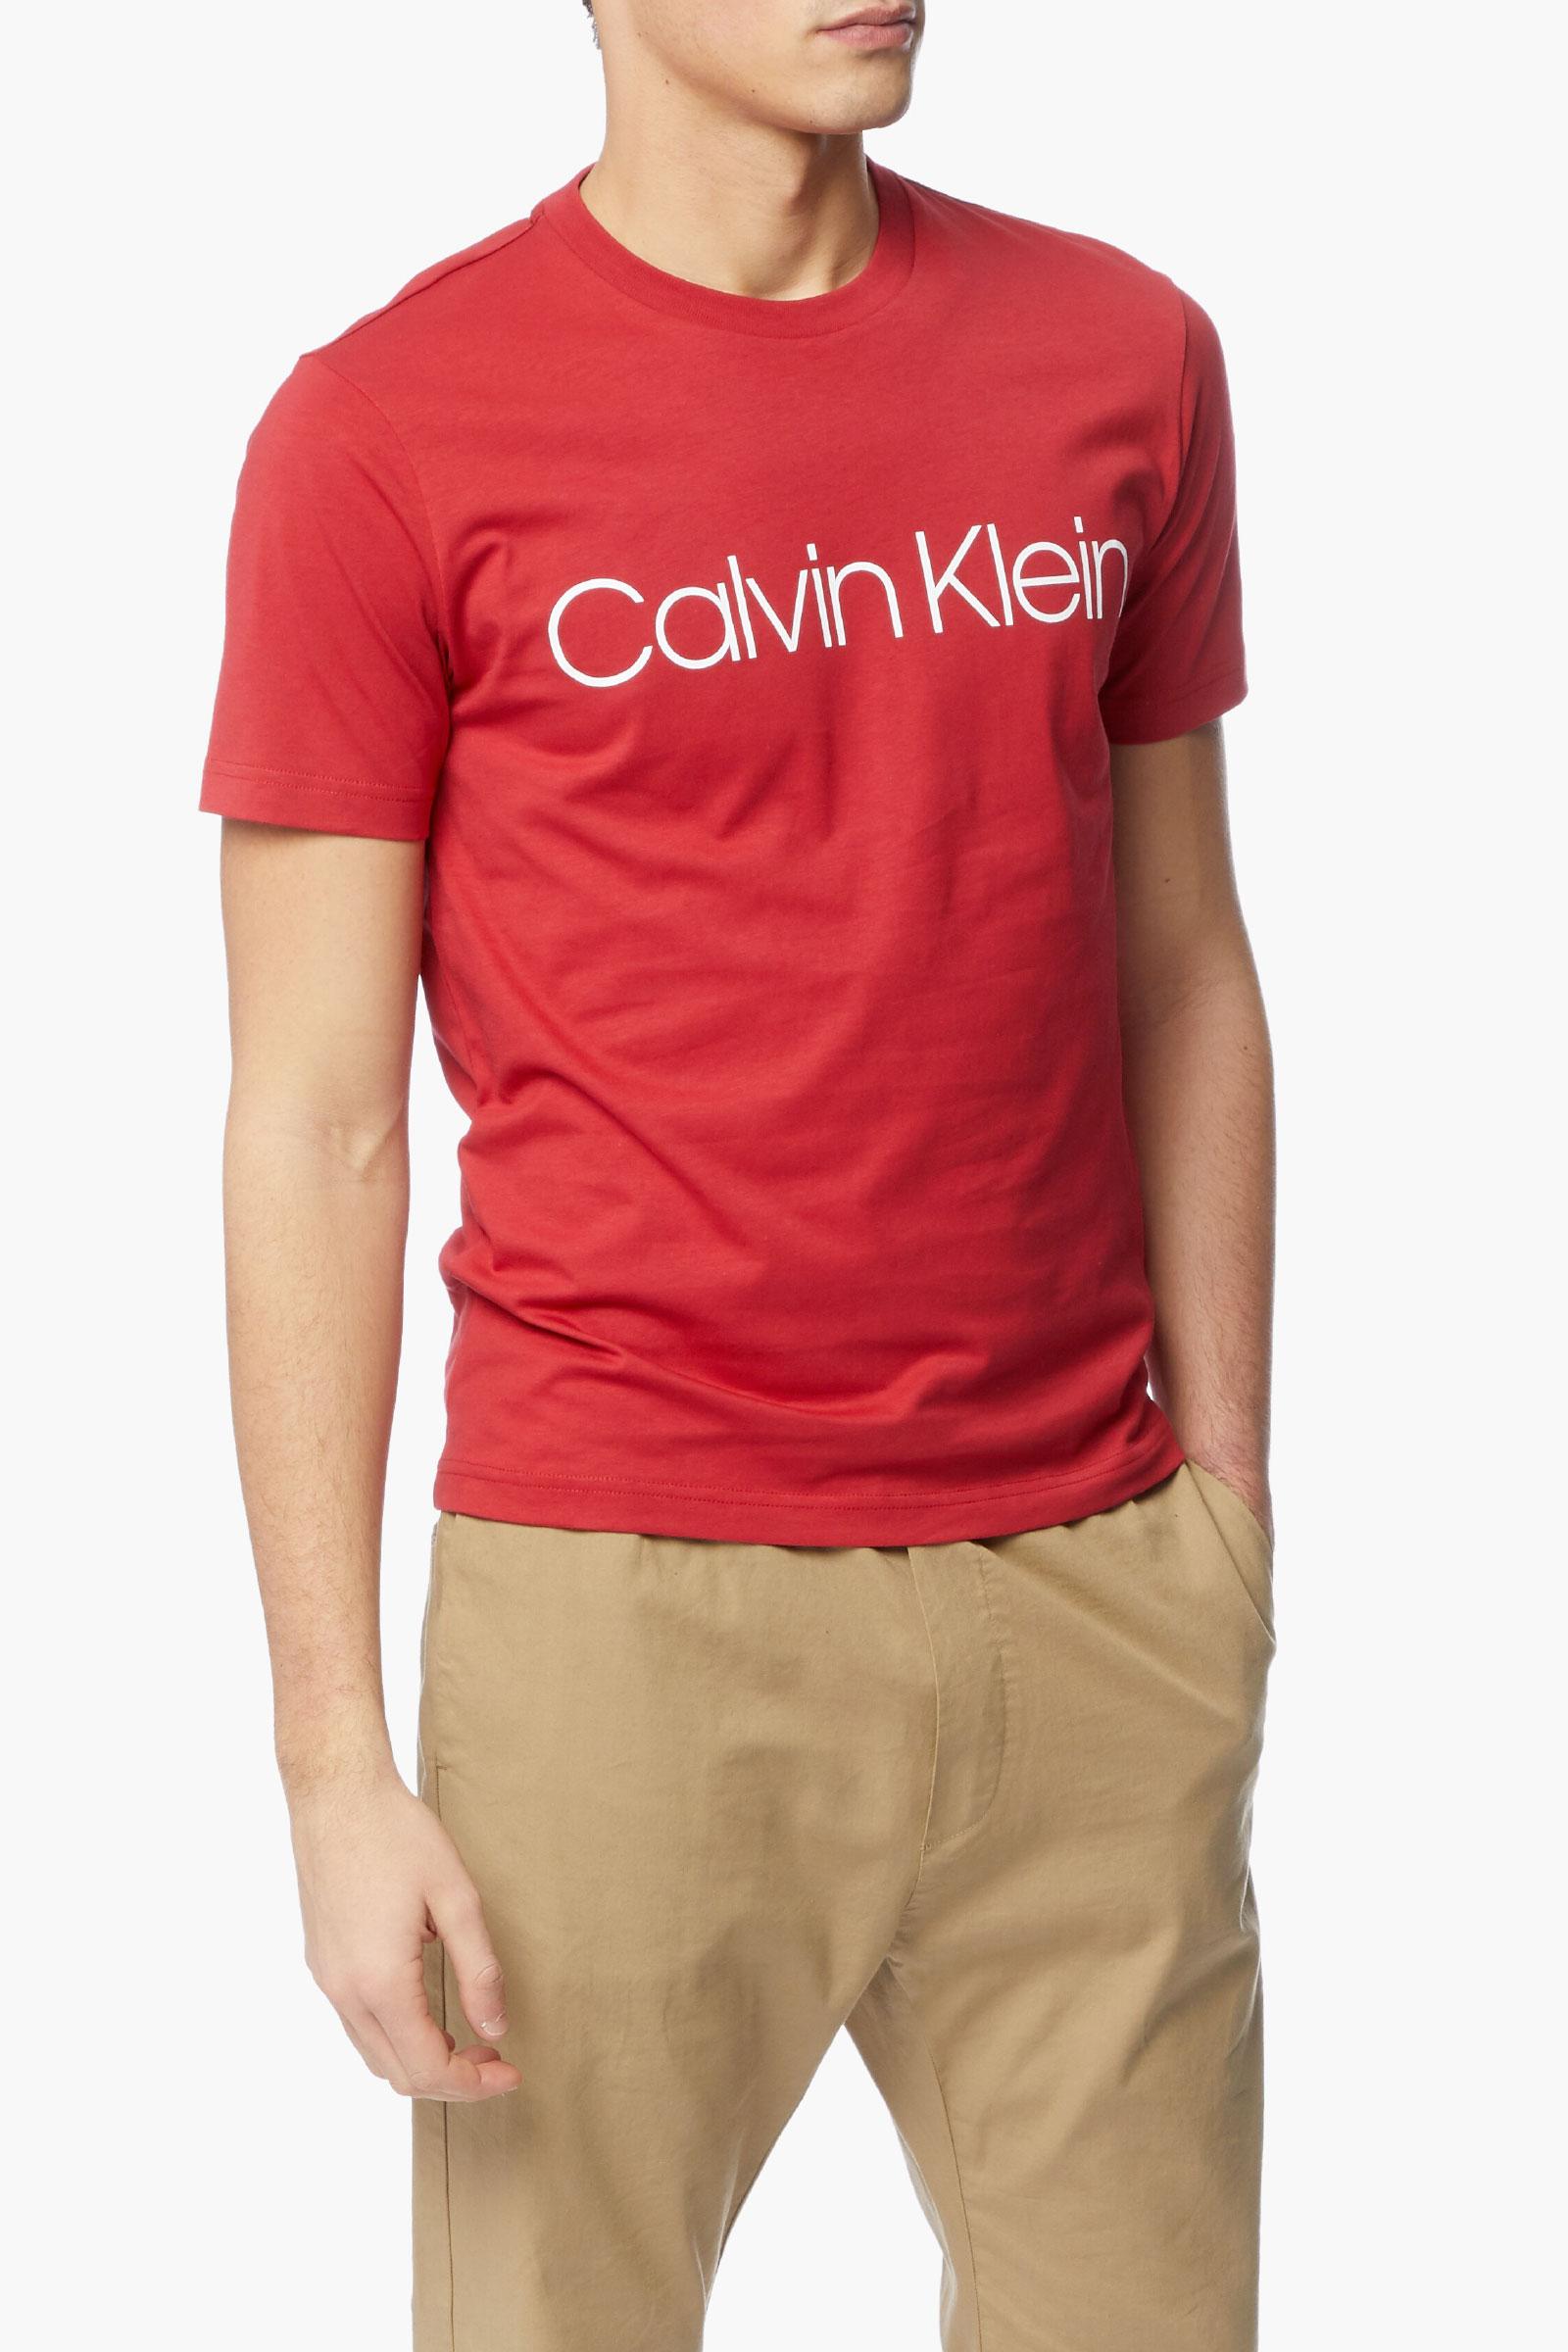 CALVIN KLEIN T-Shirt Uomo CALVIN KLEIN | T-Shirt | K10K103078XA9